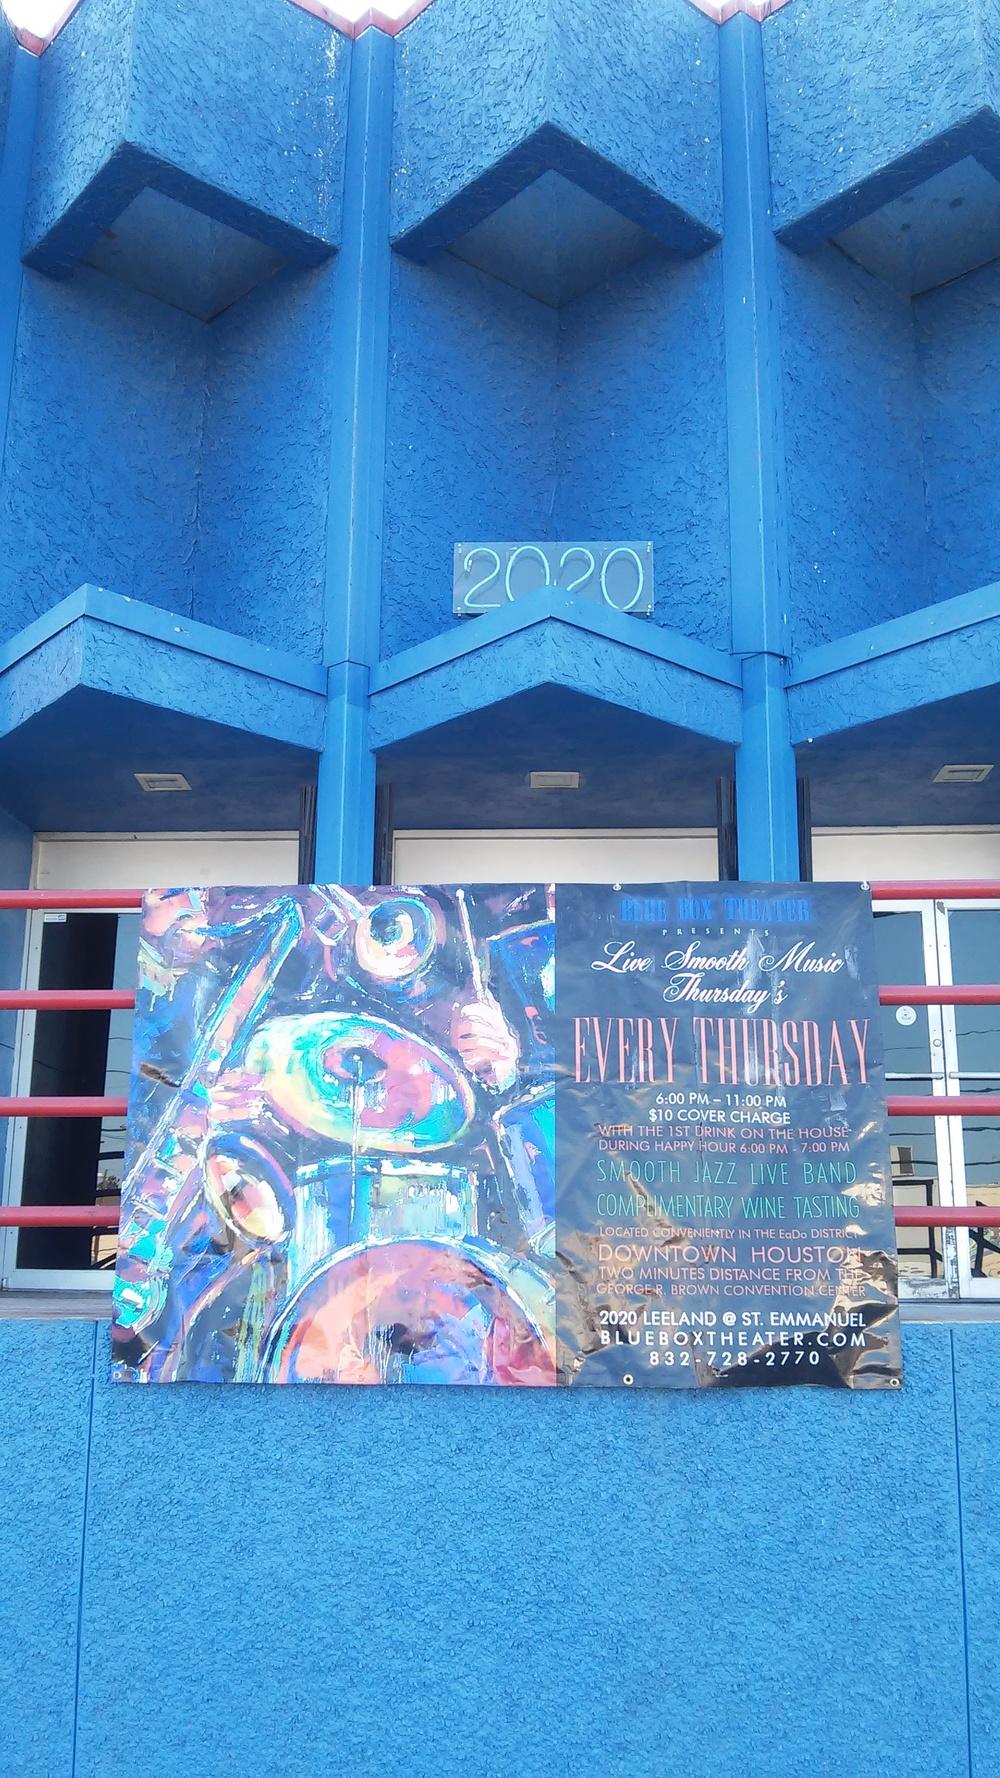 Blue Box Theater - 2020 Leland st.